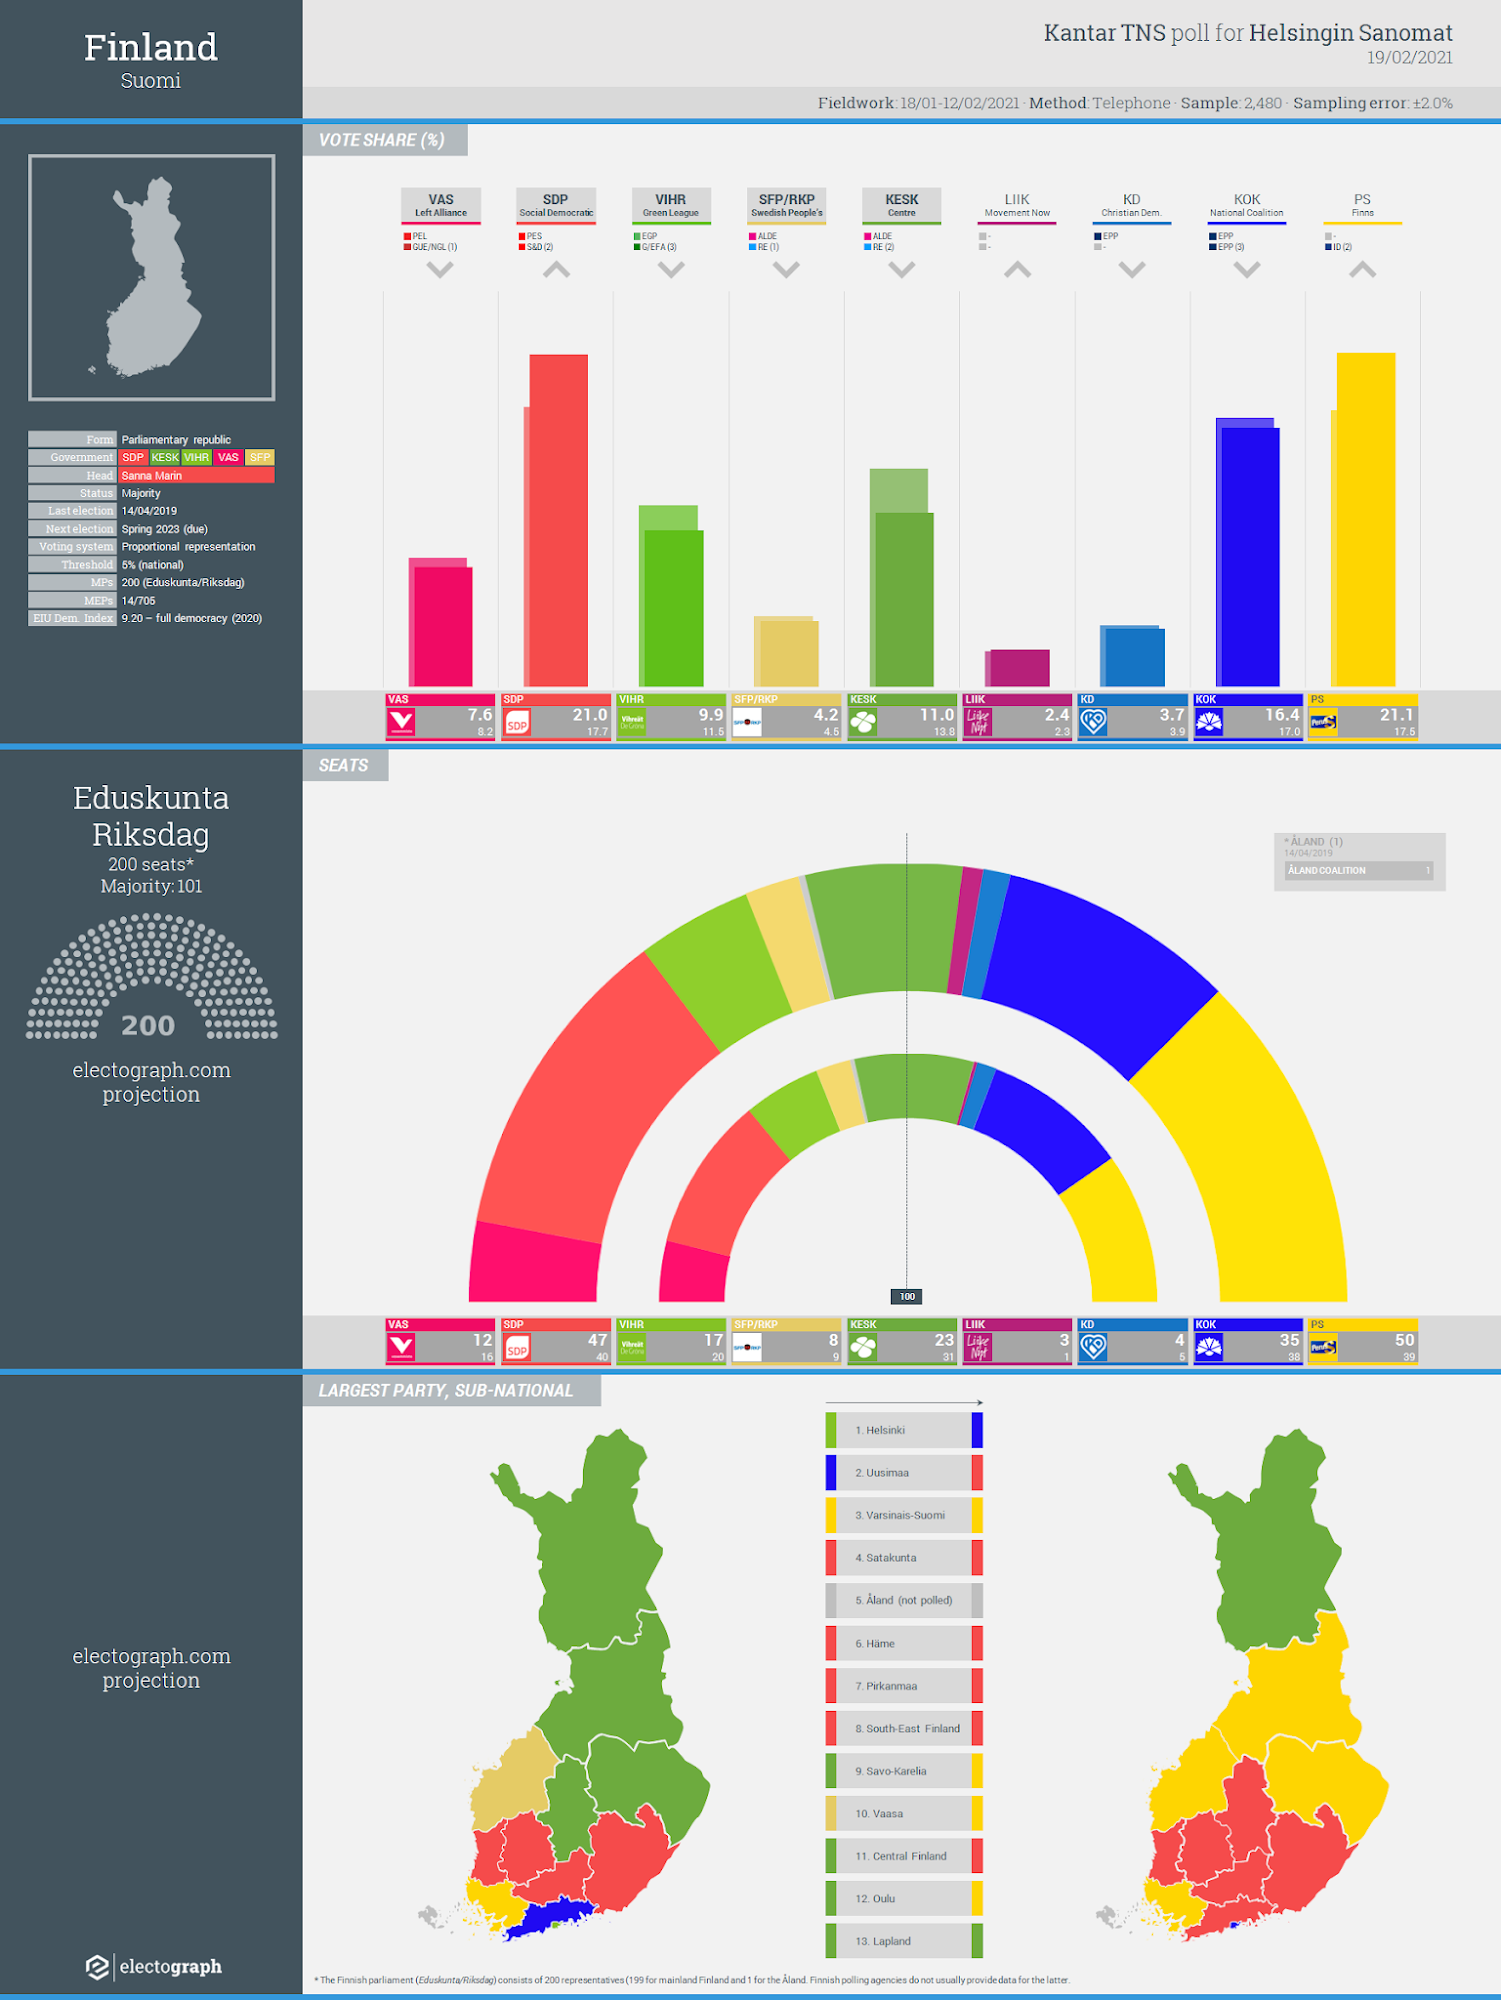 FINLAND: Kantar TNS poll chart for Helsingin Sanomat, 19 February 2021